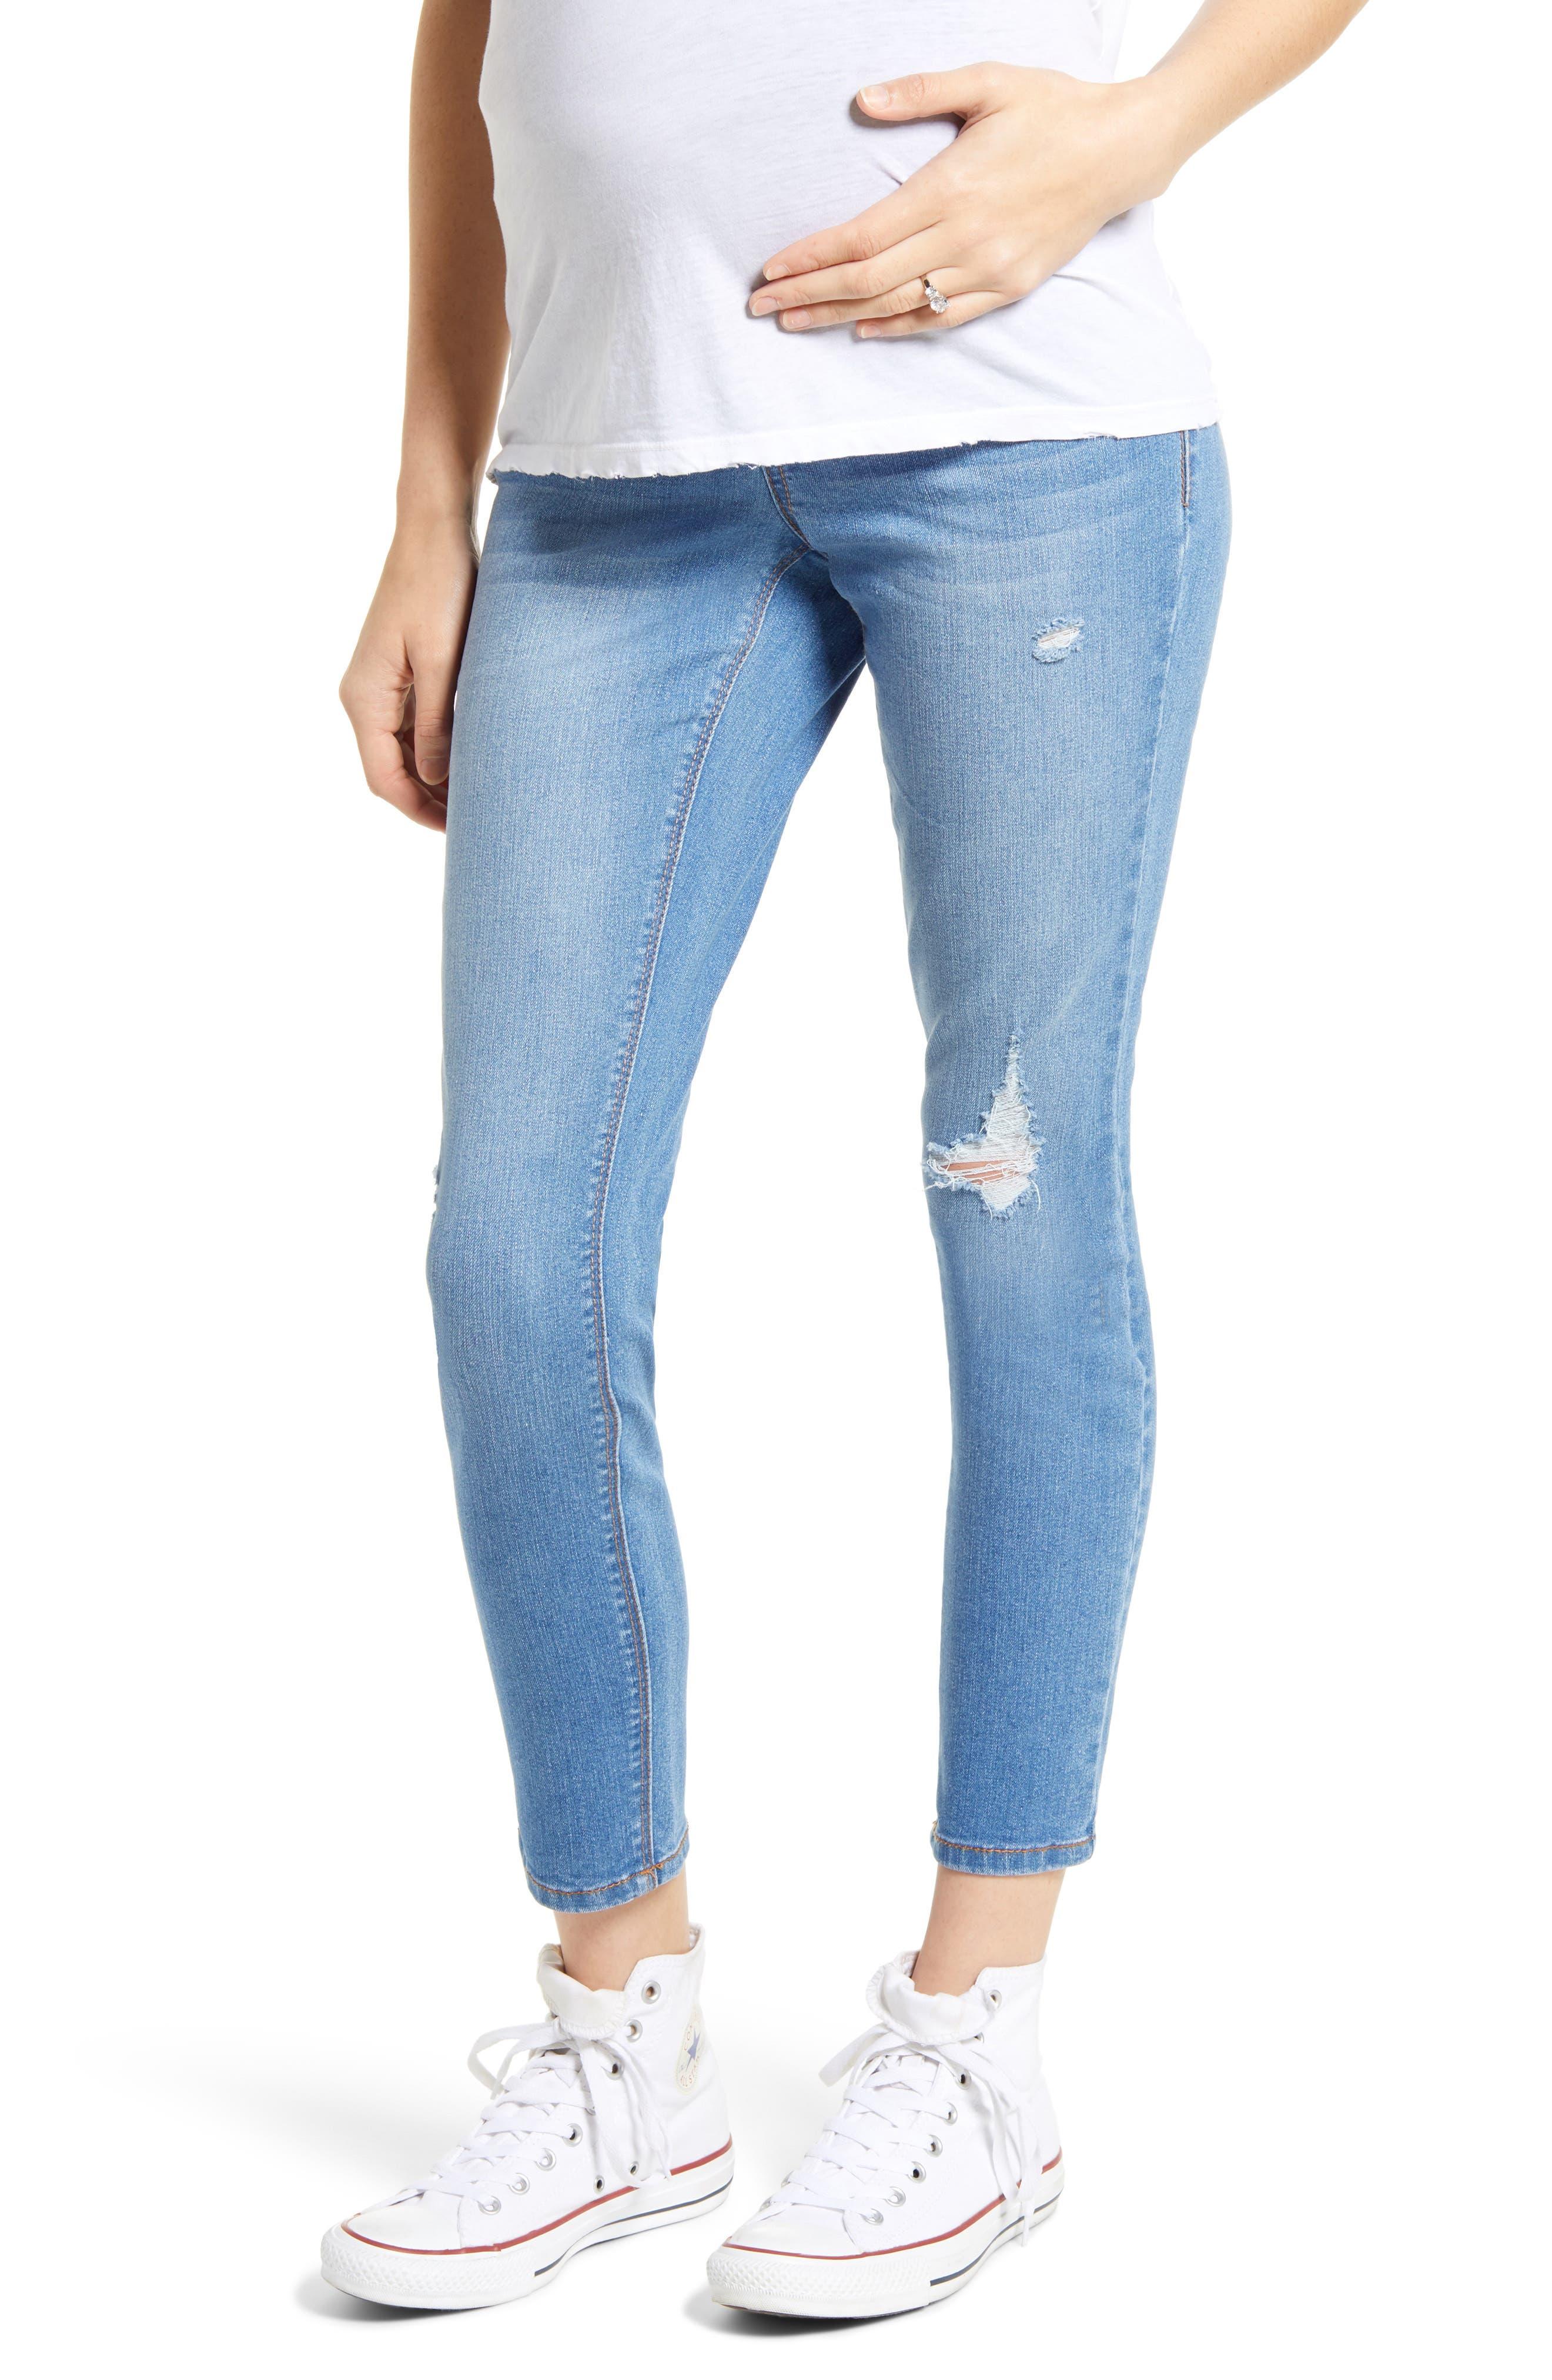 Women's 1822 Denim Ripped Ankle Skinny Jeans